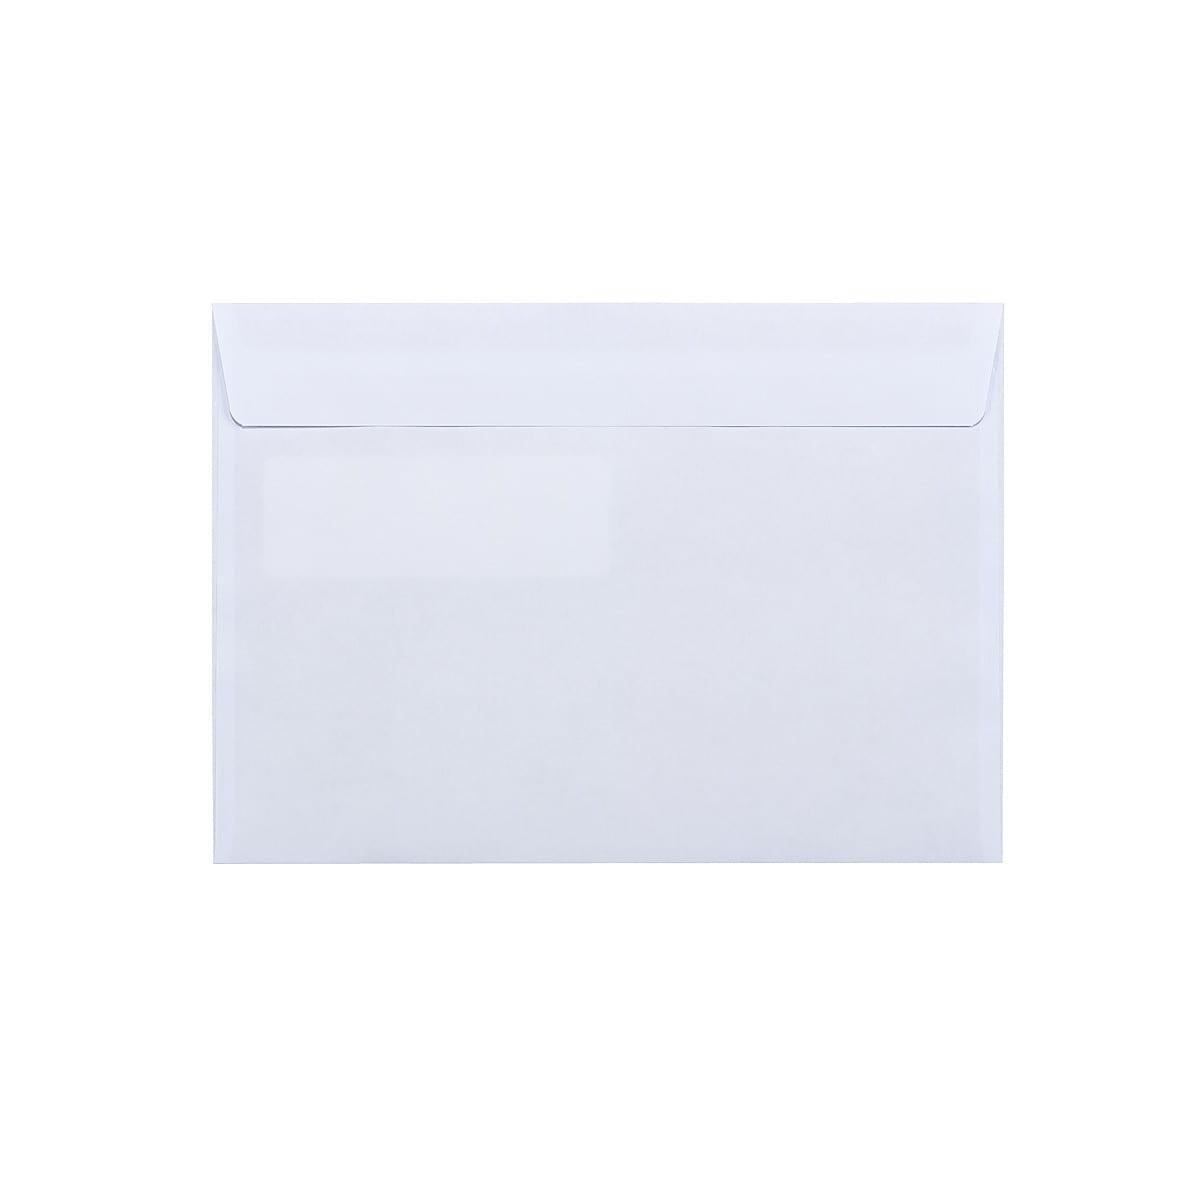 Fönsterkuvert C5 H2, vita, 50-pack